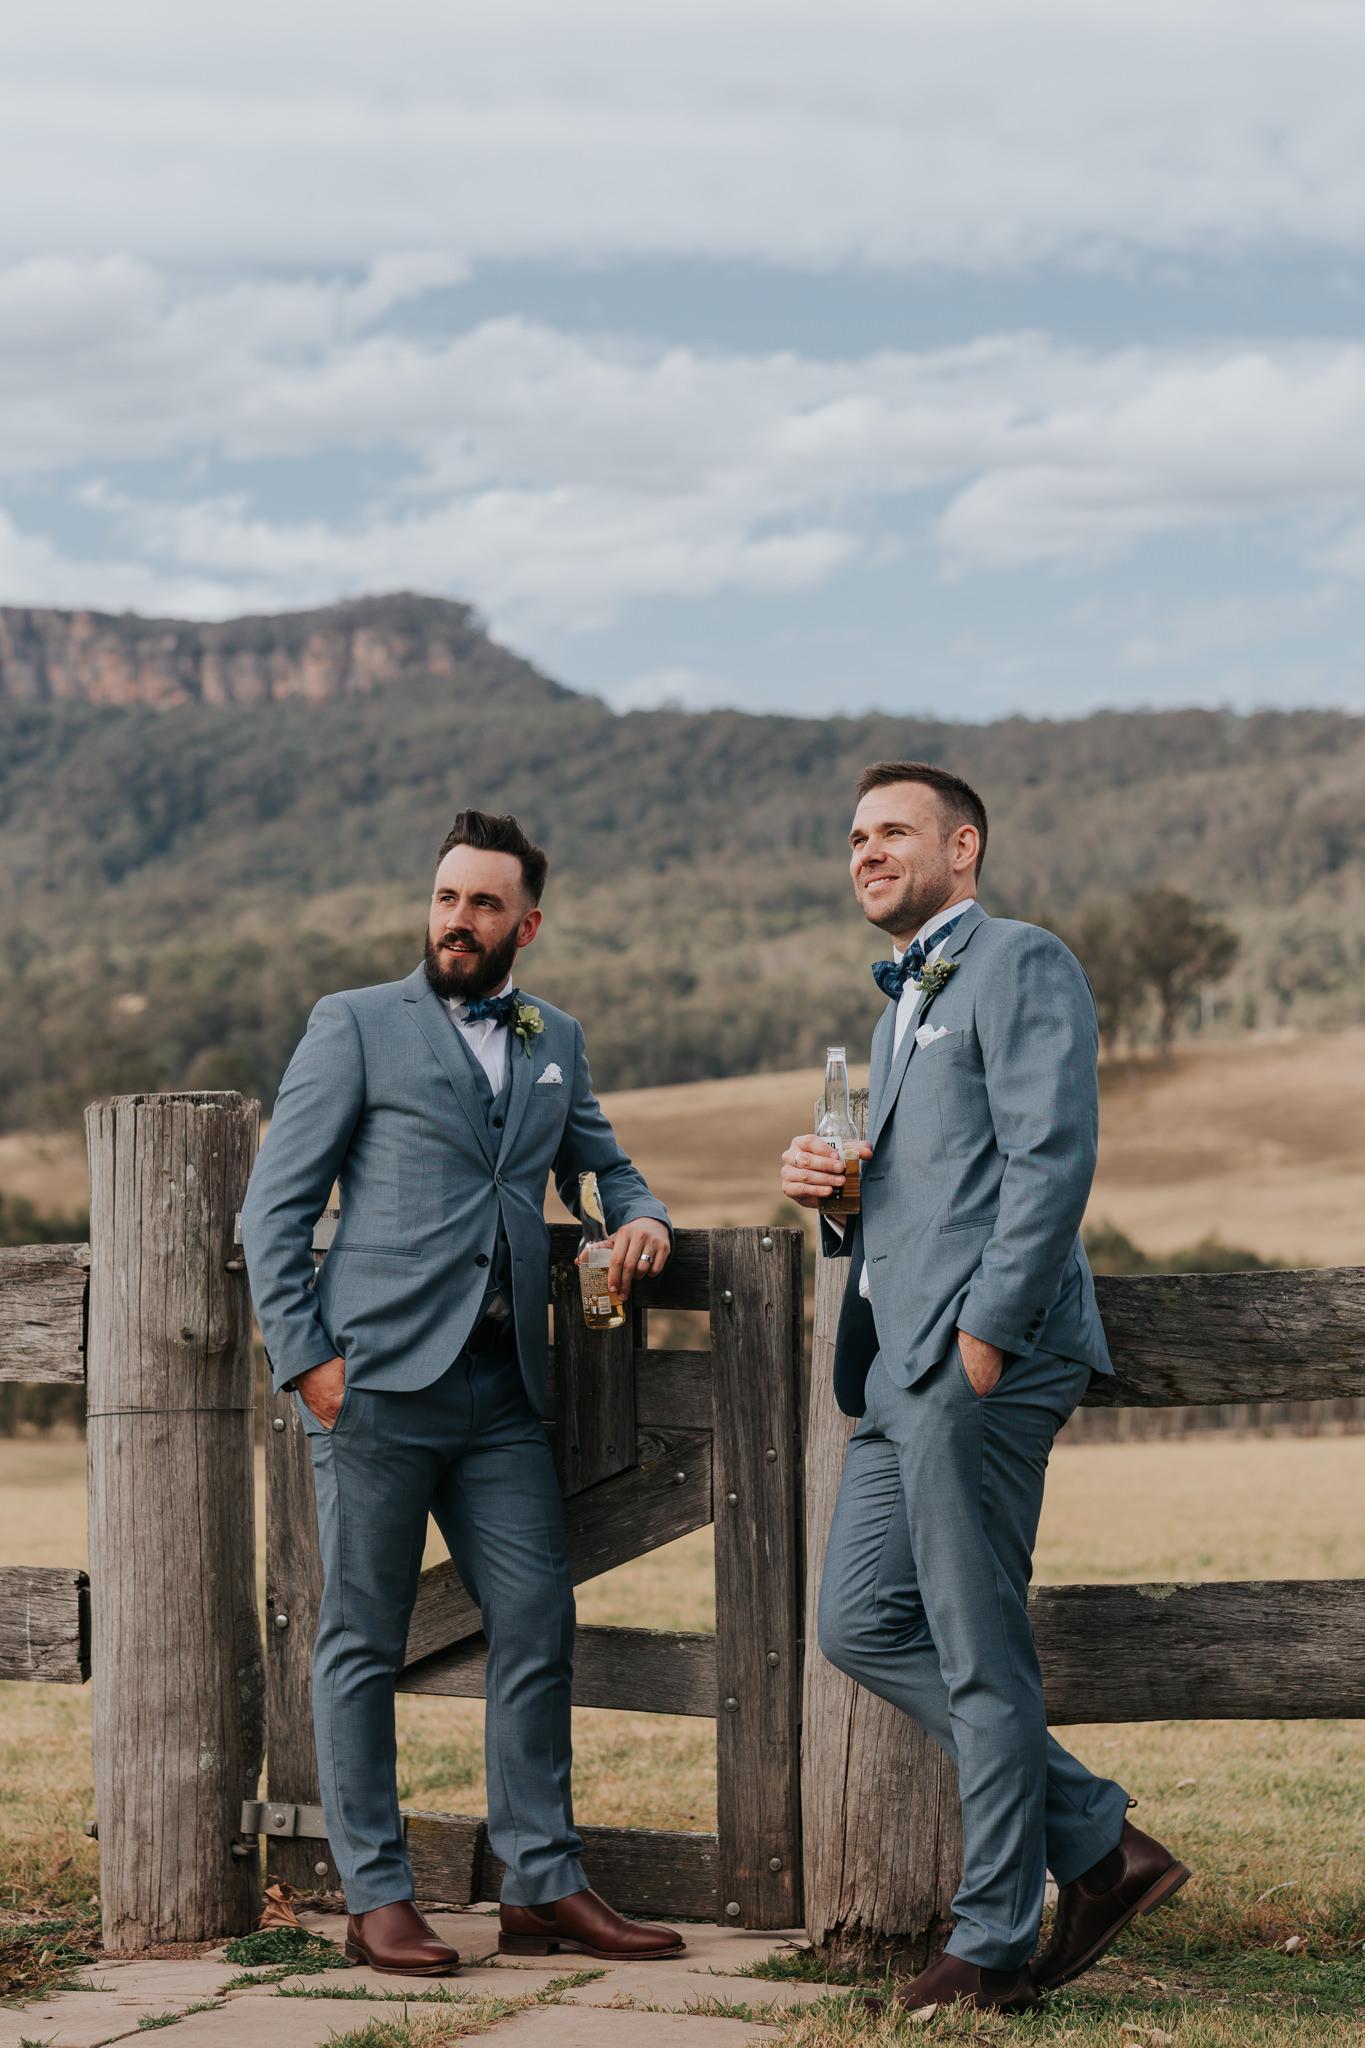 Jamie&Steve_Melross_KristieCarrickPhotography-786.jpg